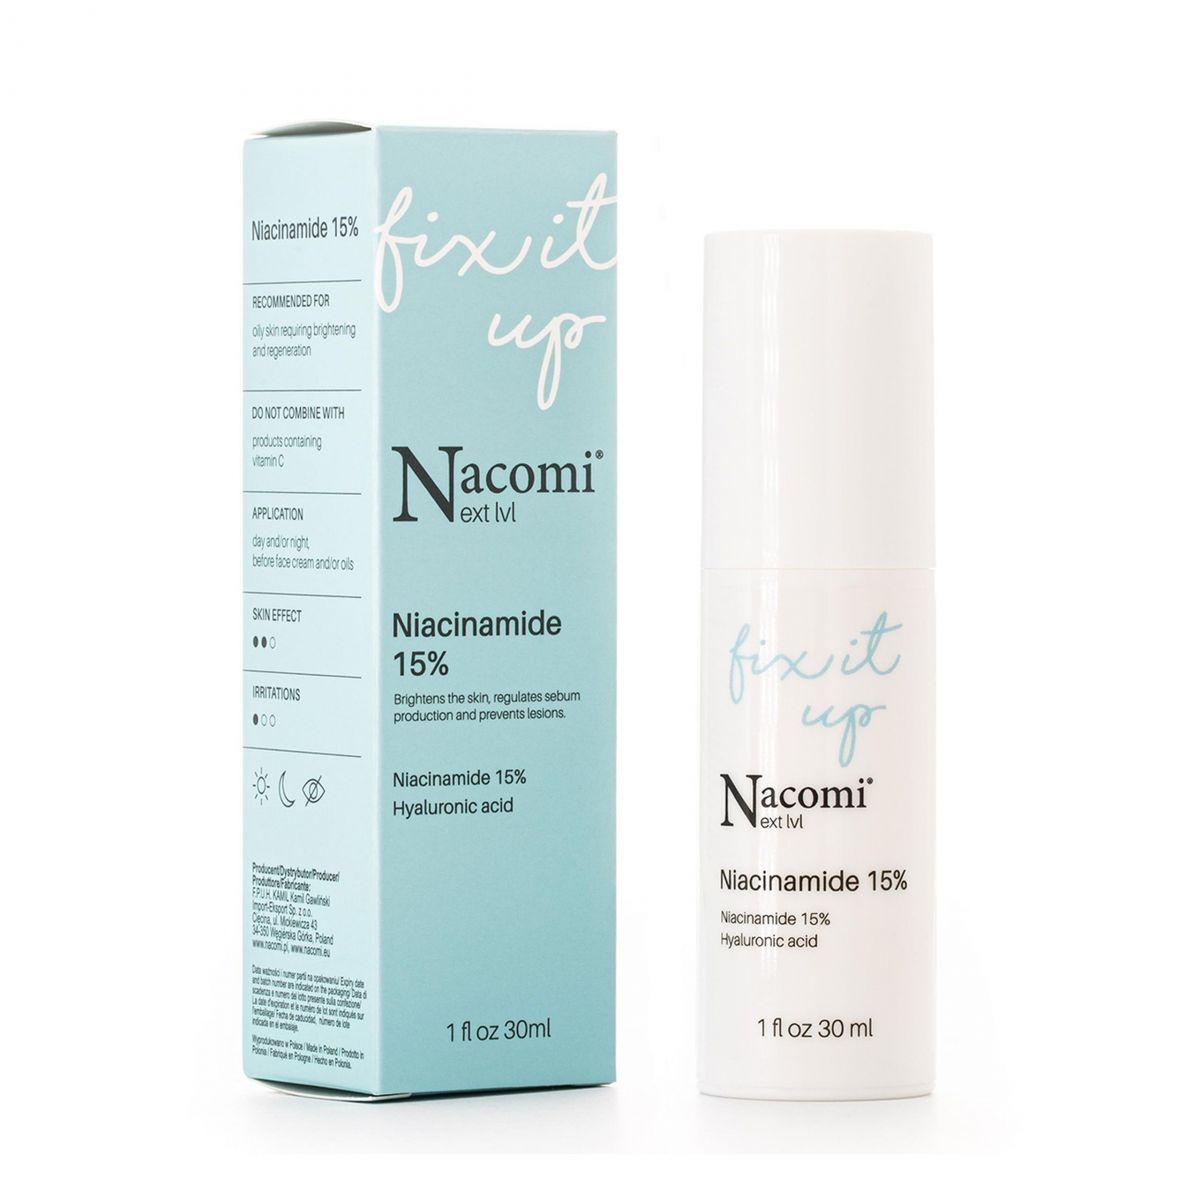 Serum Niacynamide 15% - 30ml - Nacomi